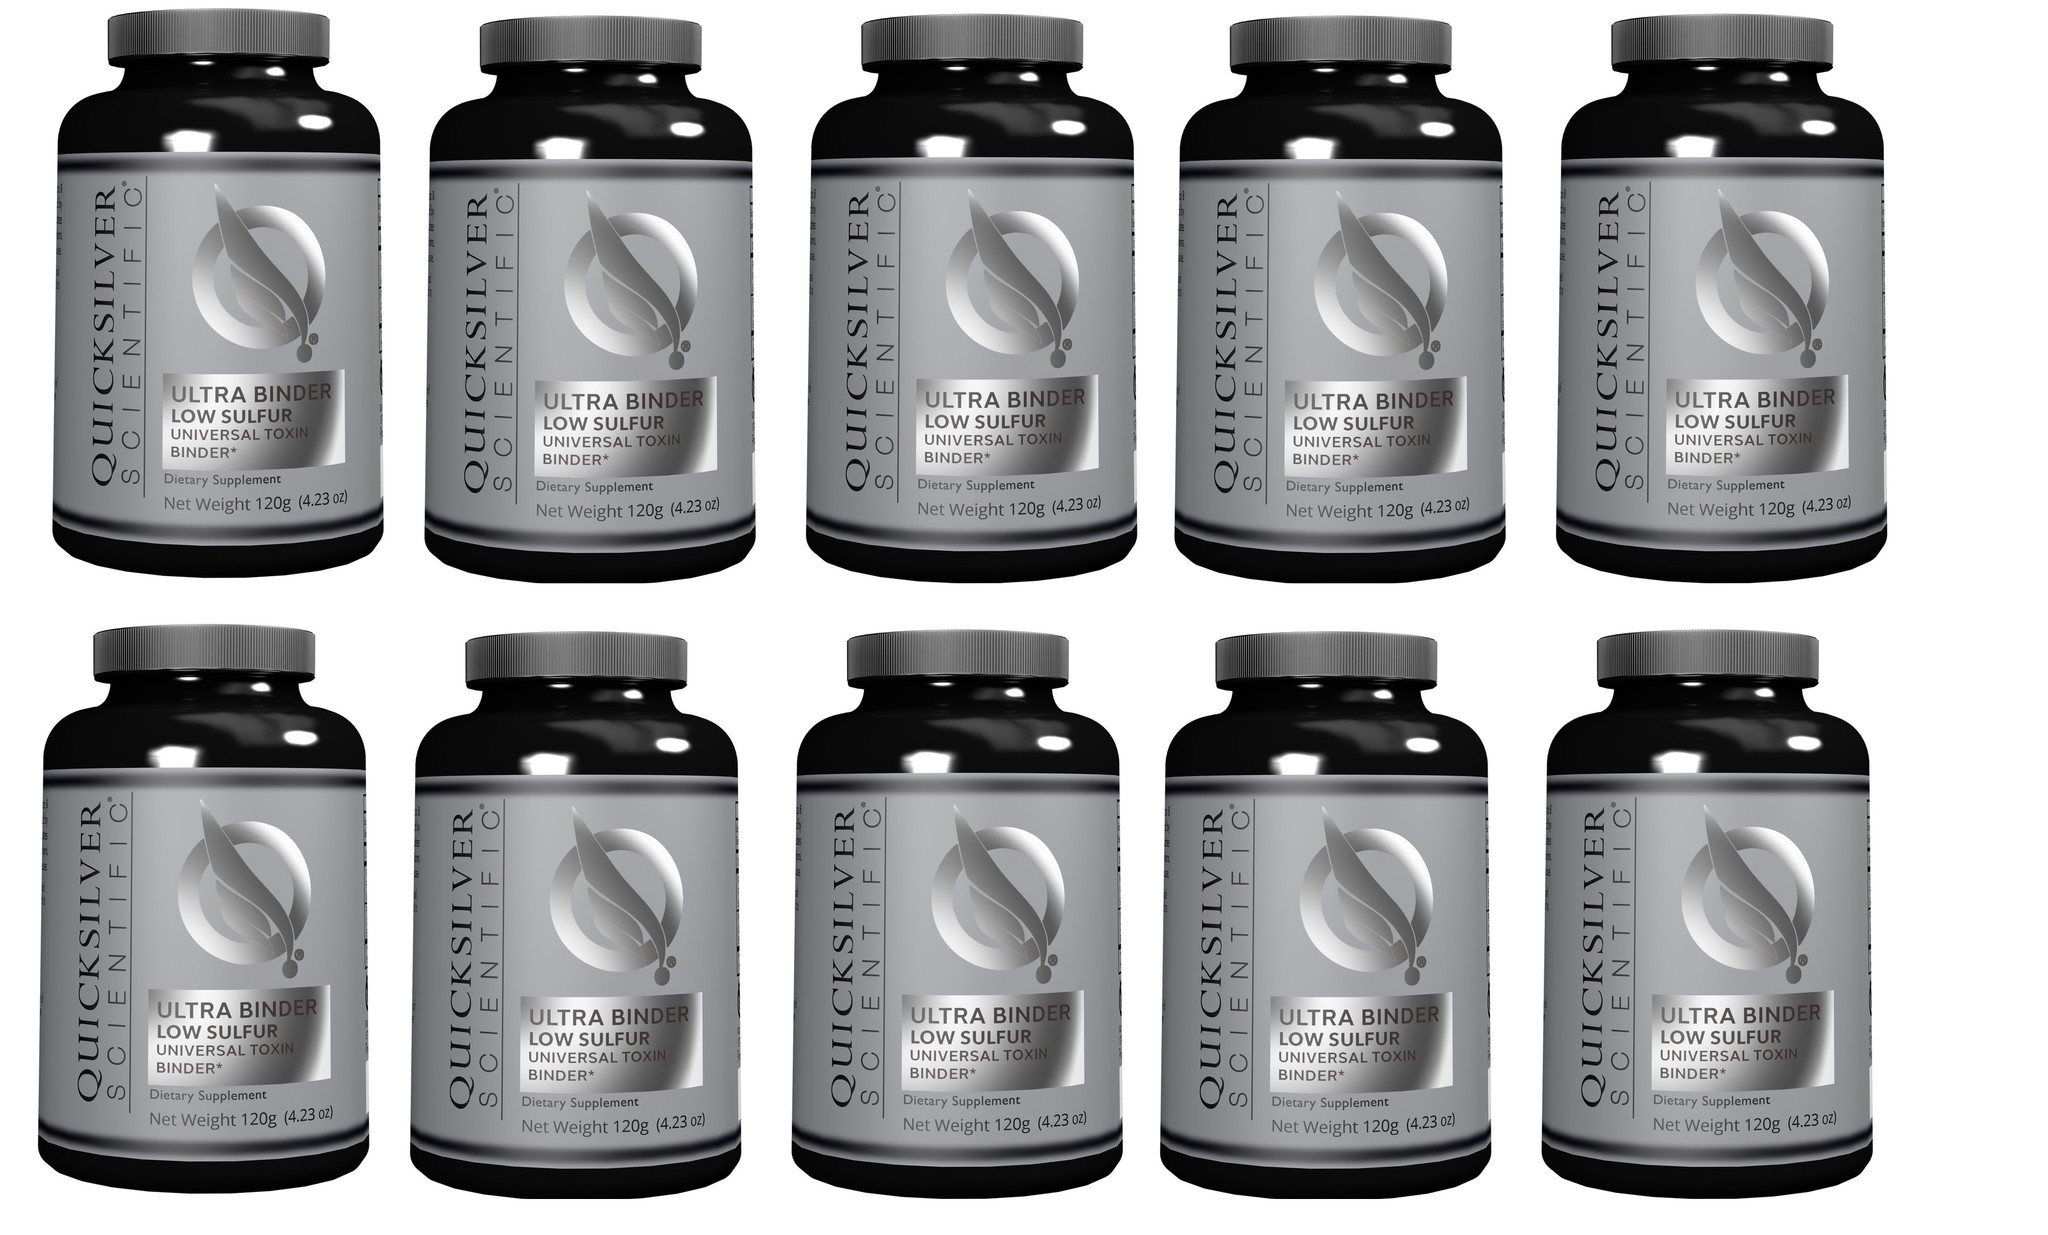 Quicksilver Scientific Ultra Binder Low Sulfur, Universal Toxin Binder, 120 g, 10-packs